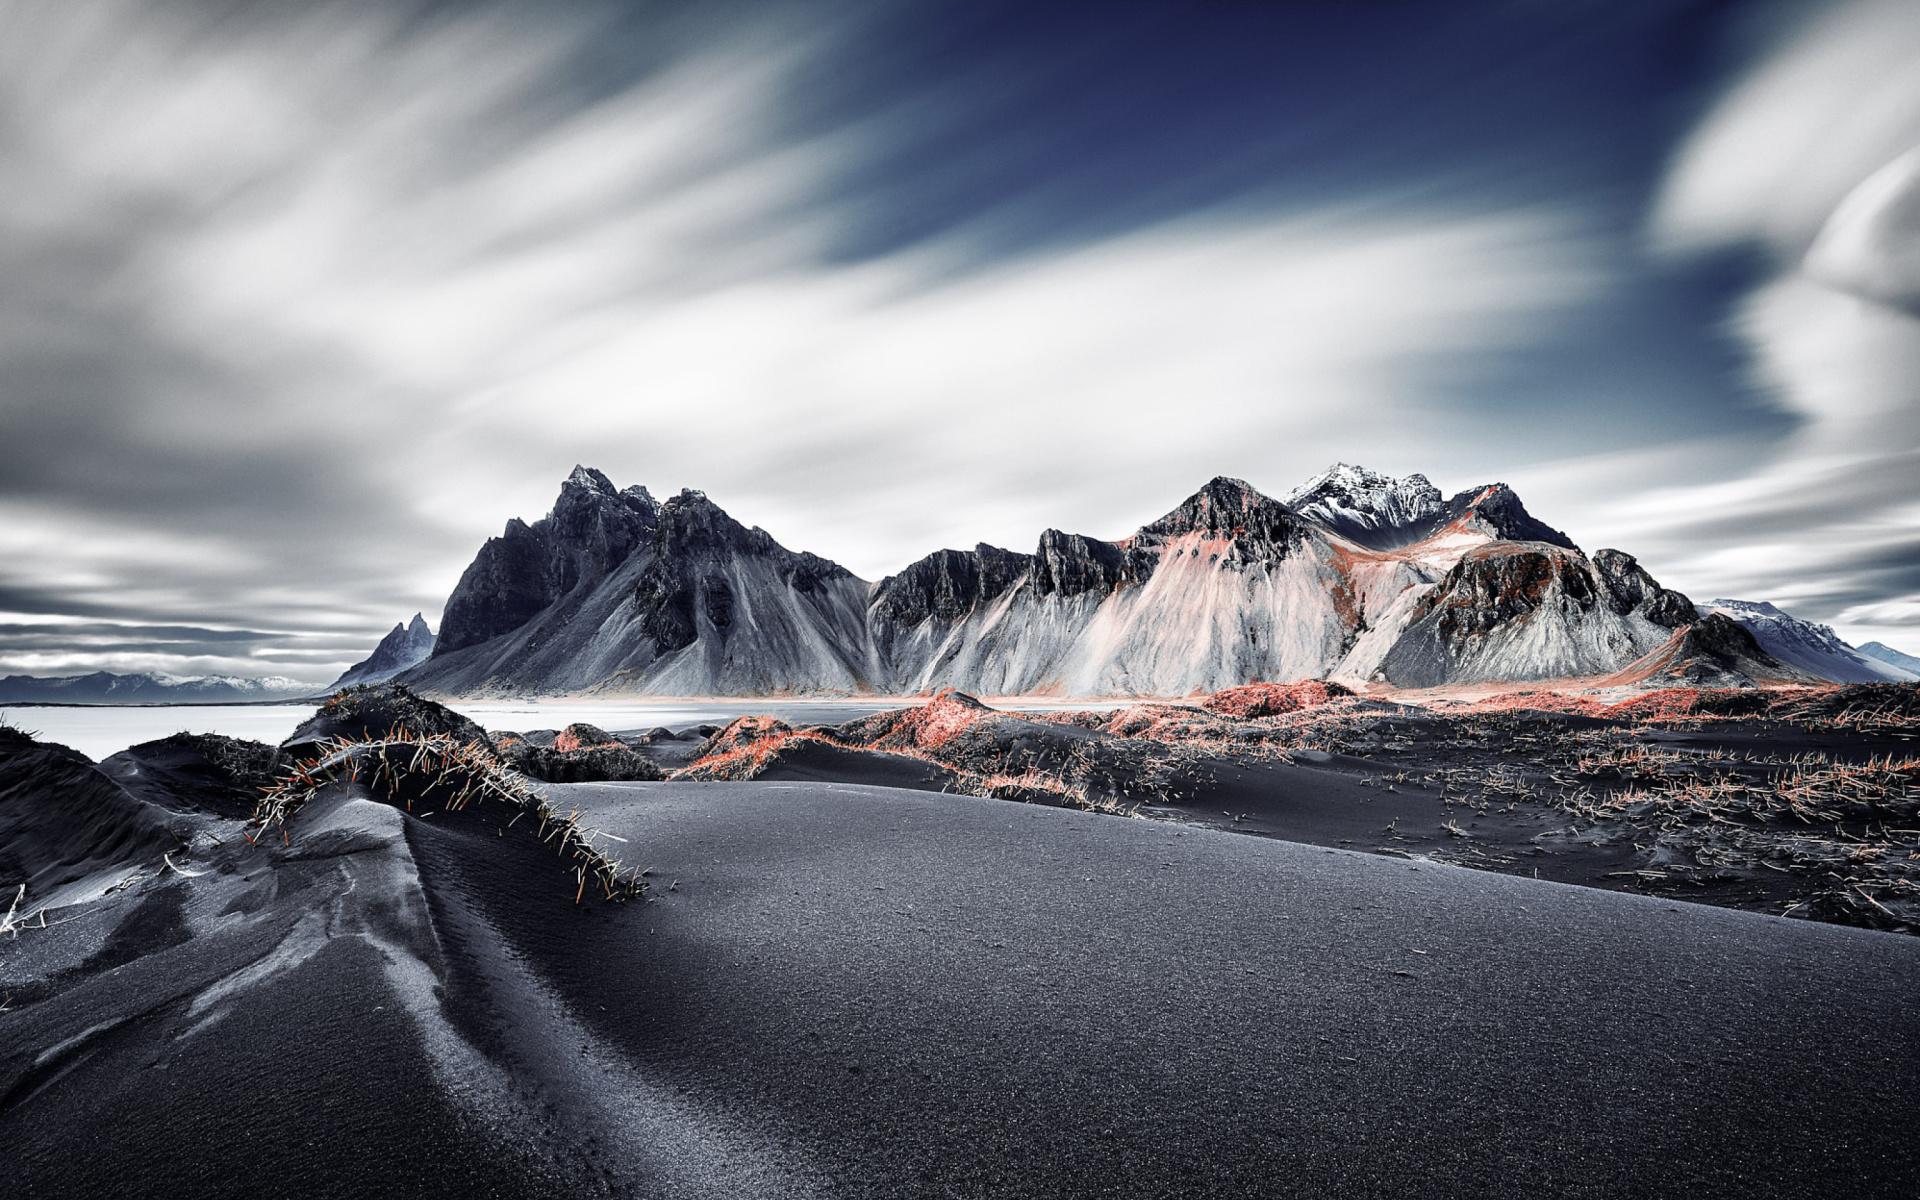 Black Mountains Wallpaper For Widescreen Desktop Pc 1920x1080 Full Hd